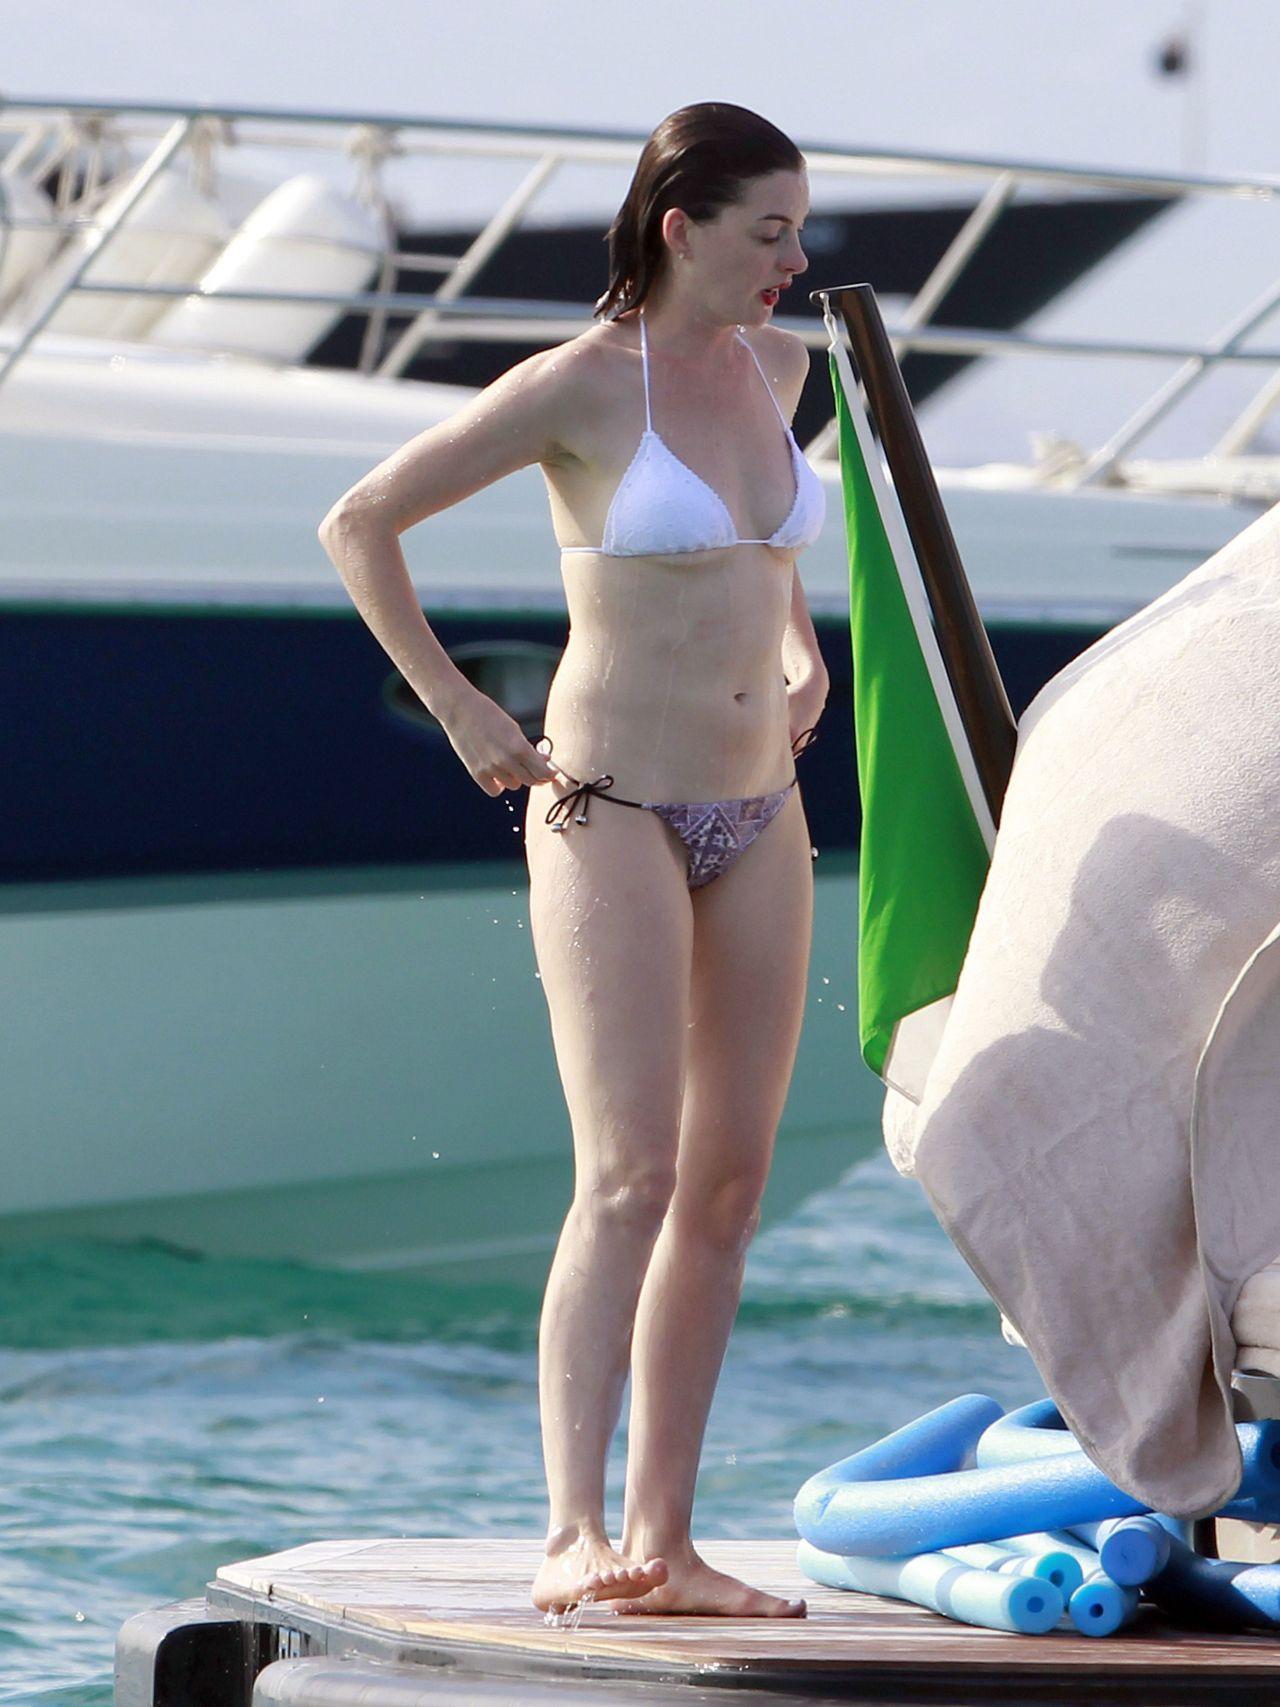 Anne Hathaway odia que la vean en bikini - Univision